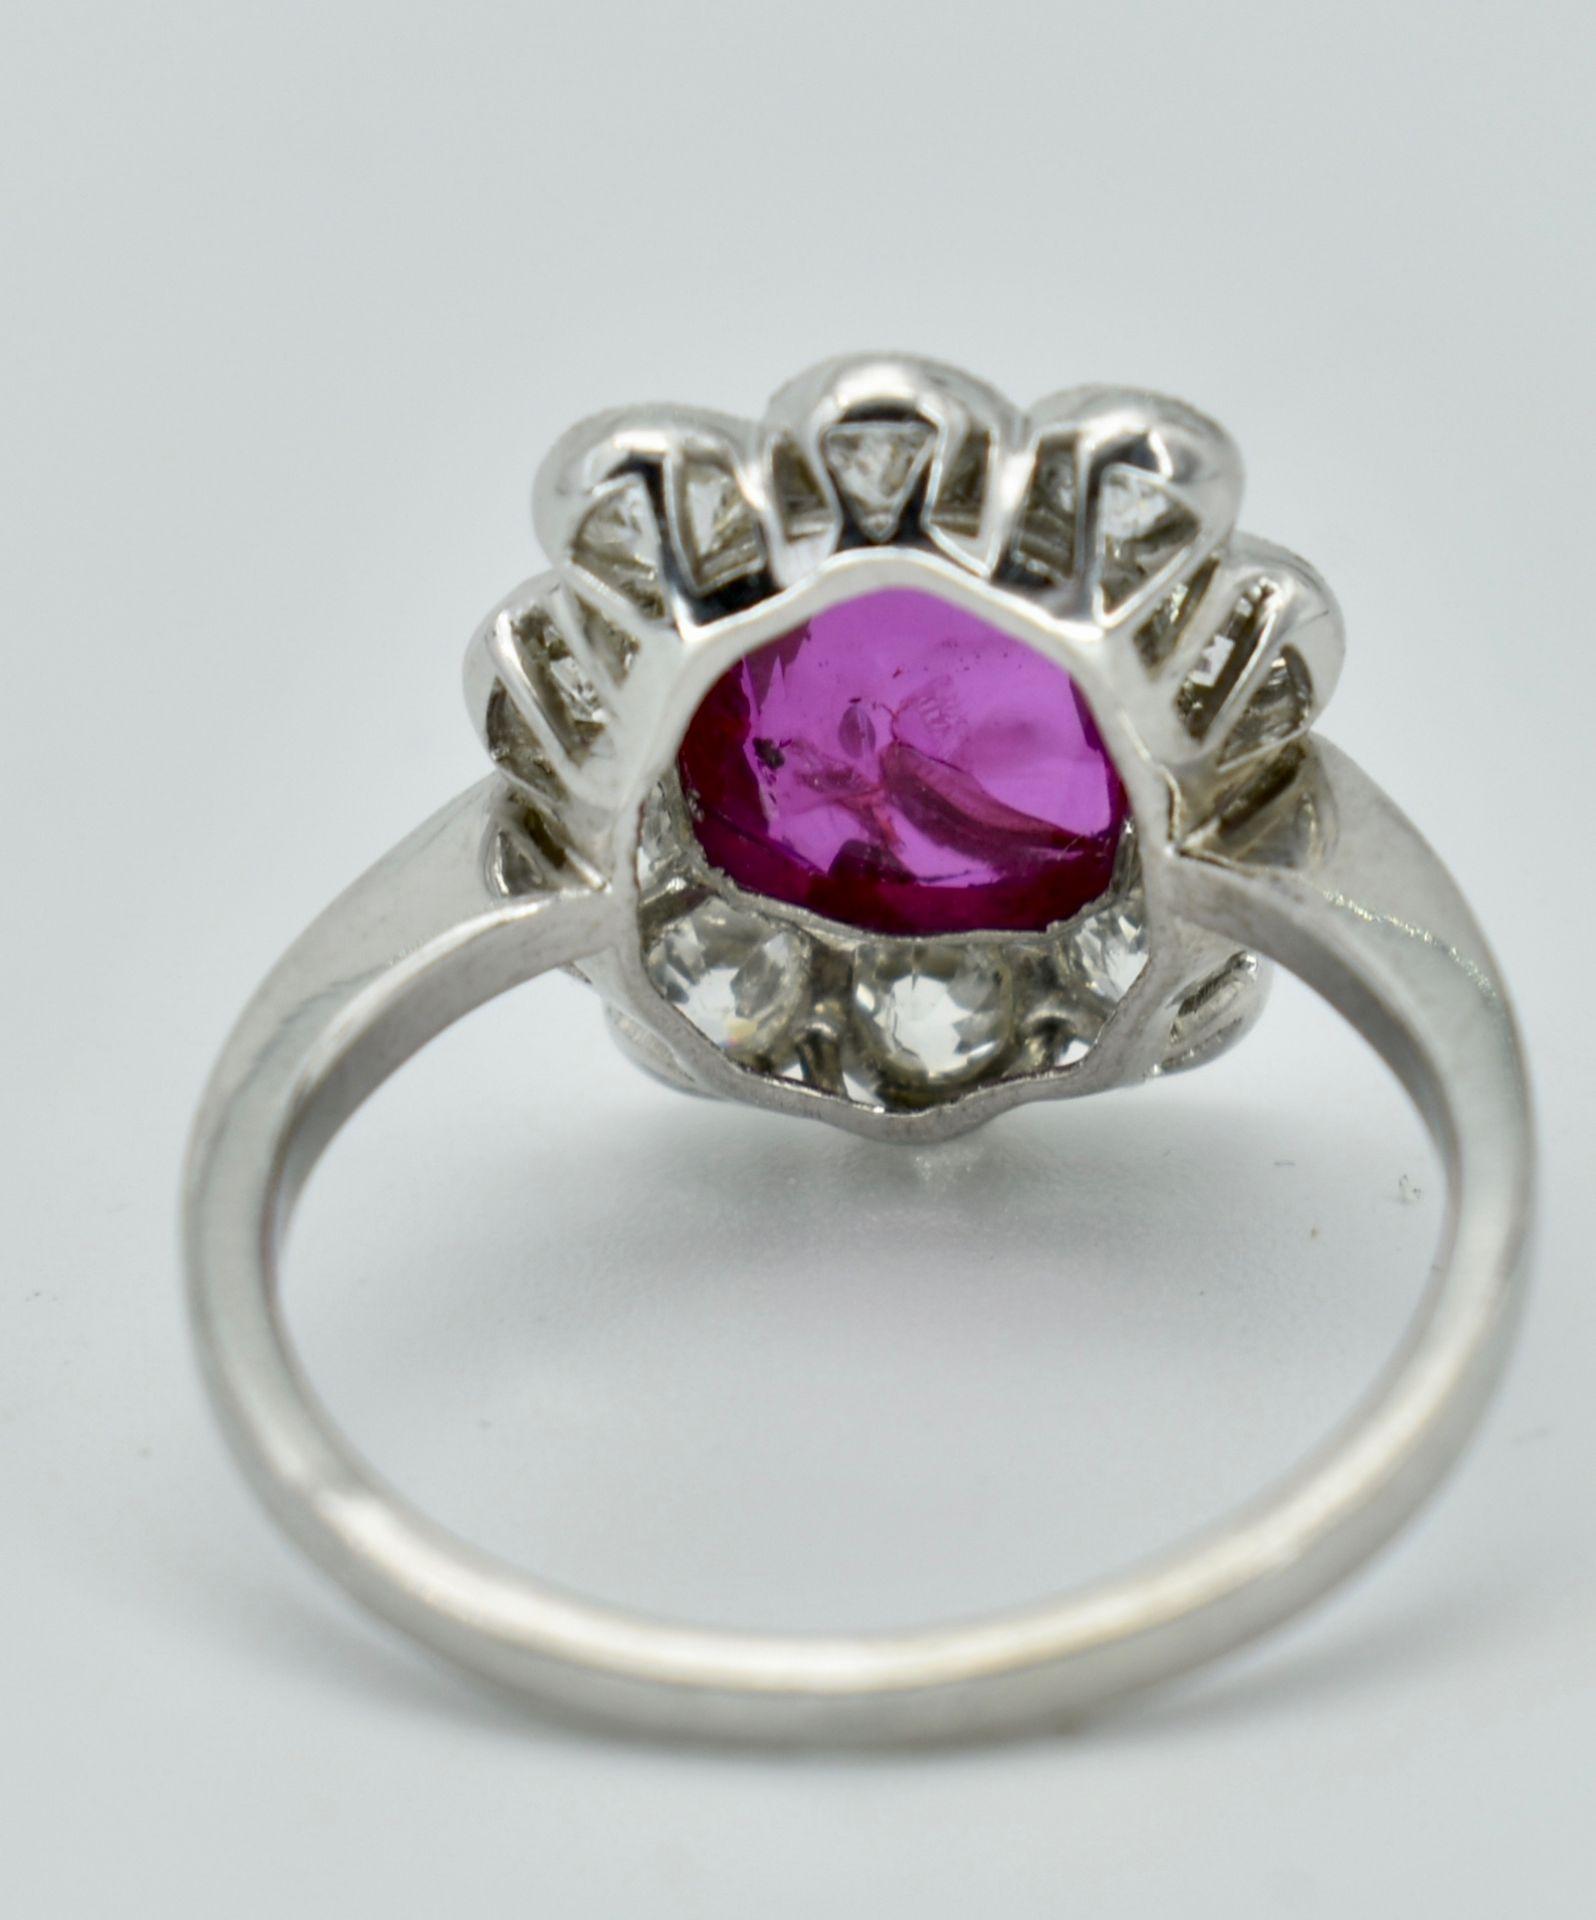 950 Platinum Burma Ruby & Diamond Cluster Ring - Image 3 of 5